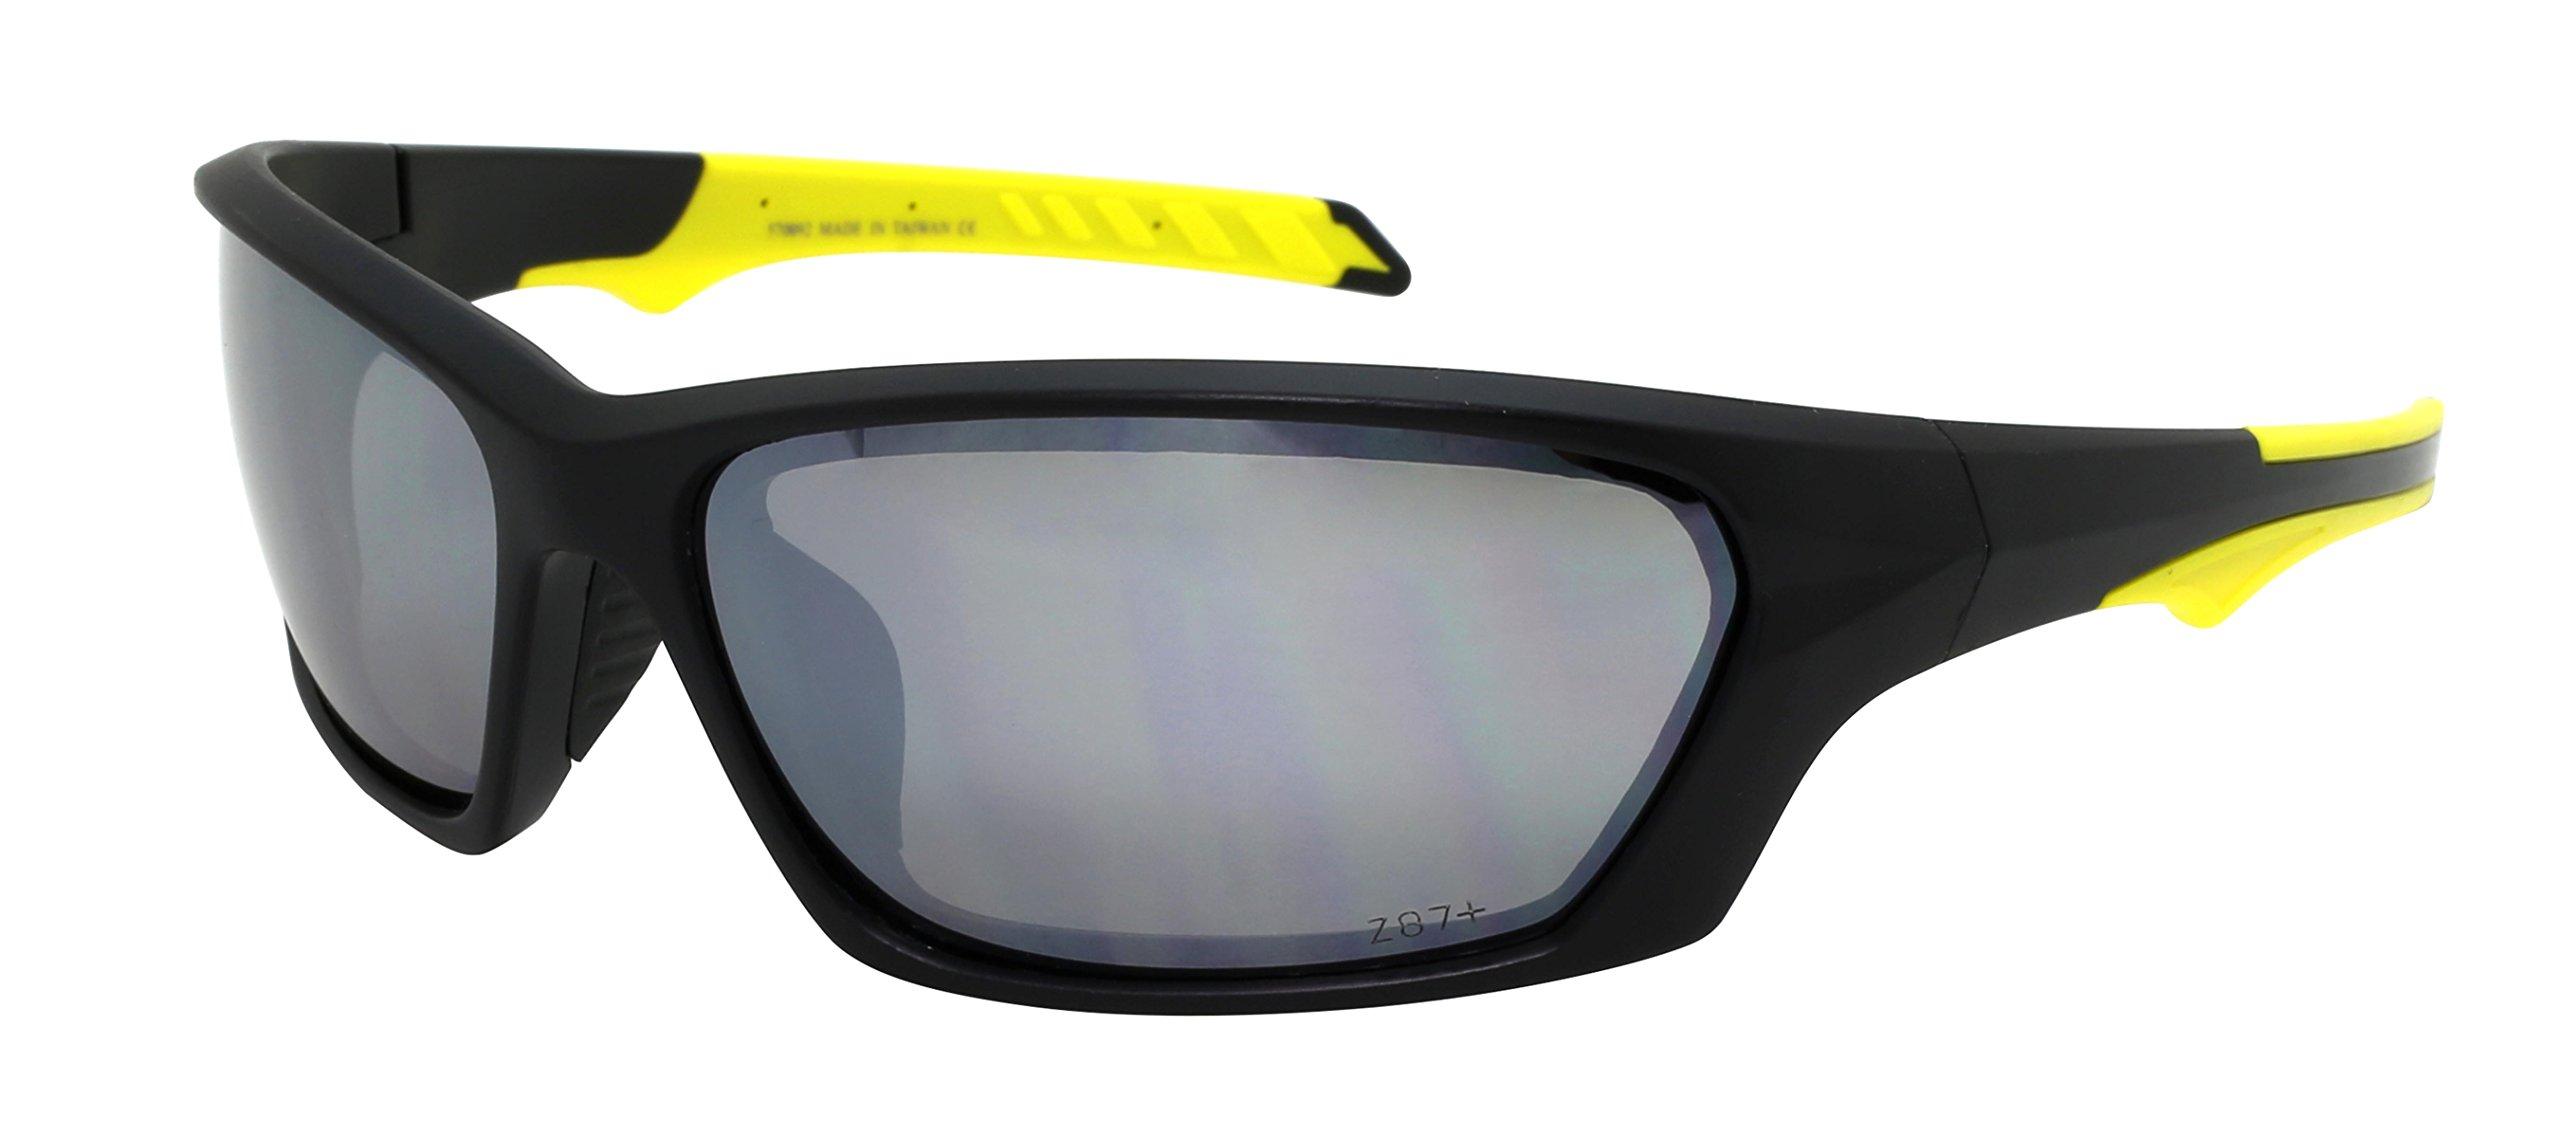 Edge I-Wear Sports Safety Sunglasses ANSI Z87+ Color Mirror Lens 570092/REV-3(MBLK. wm)